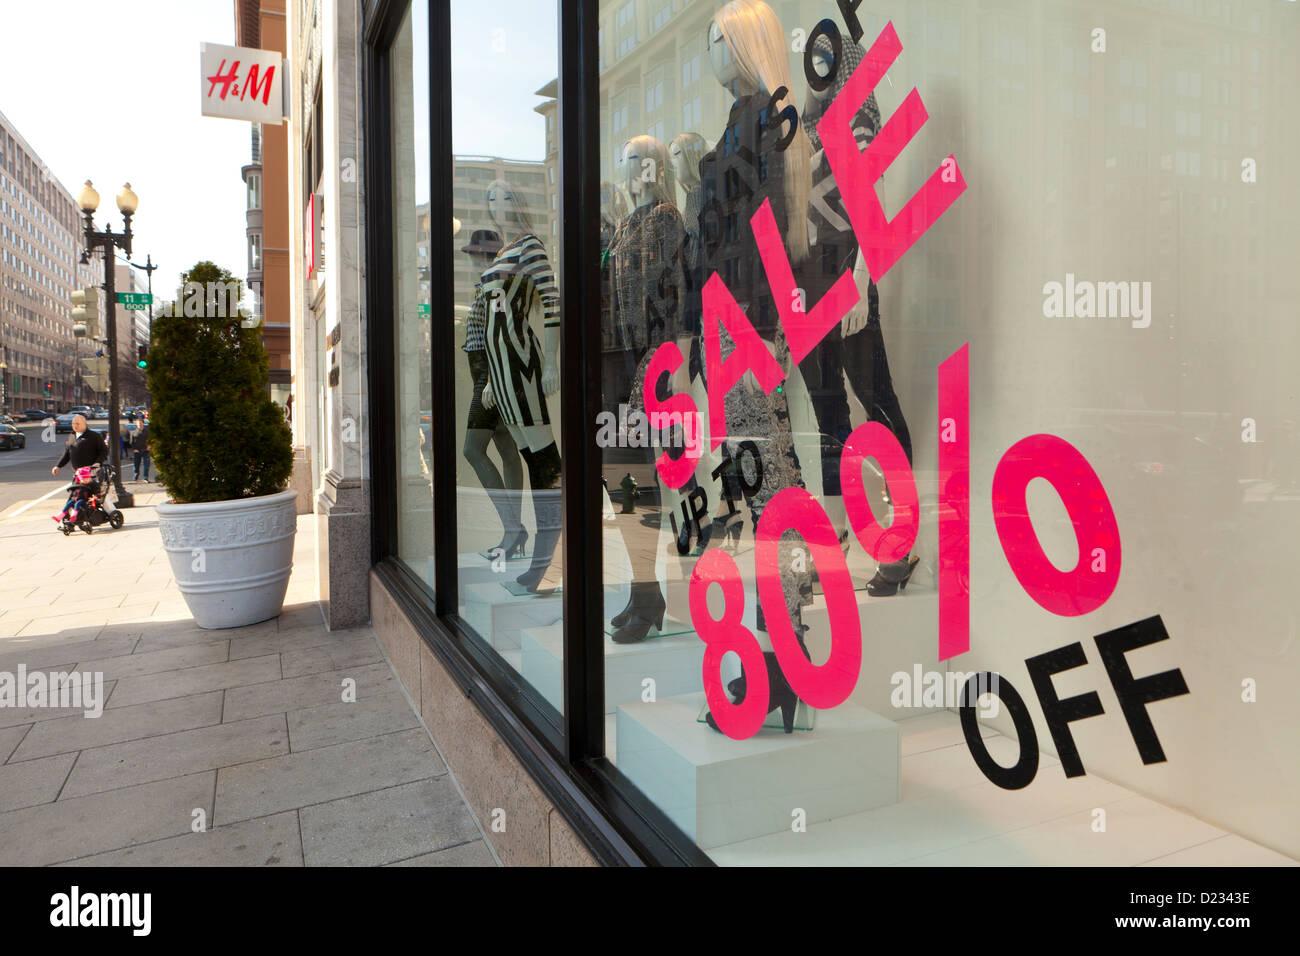 80% off sale sign on H&M clothing store window display - Washington, DC USA - Stock Image